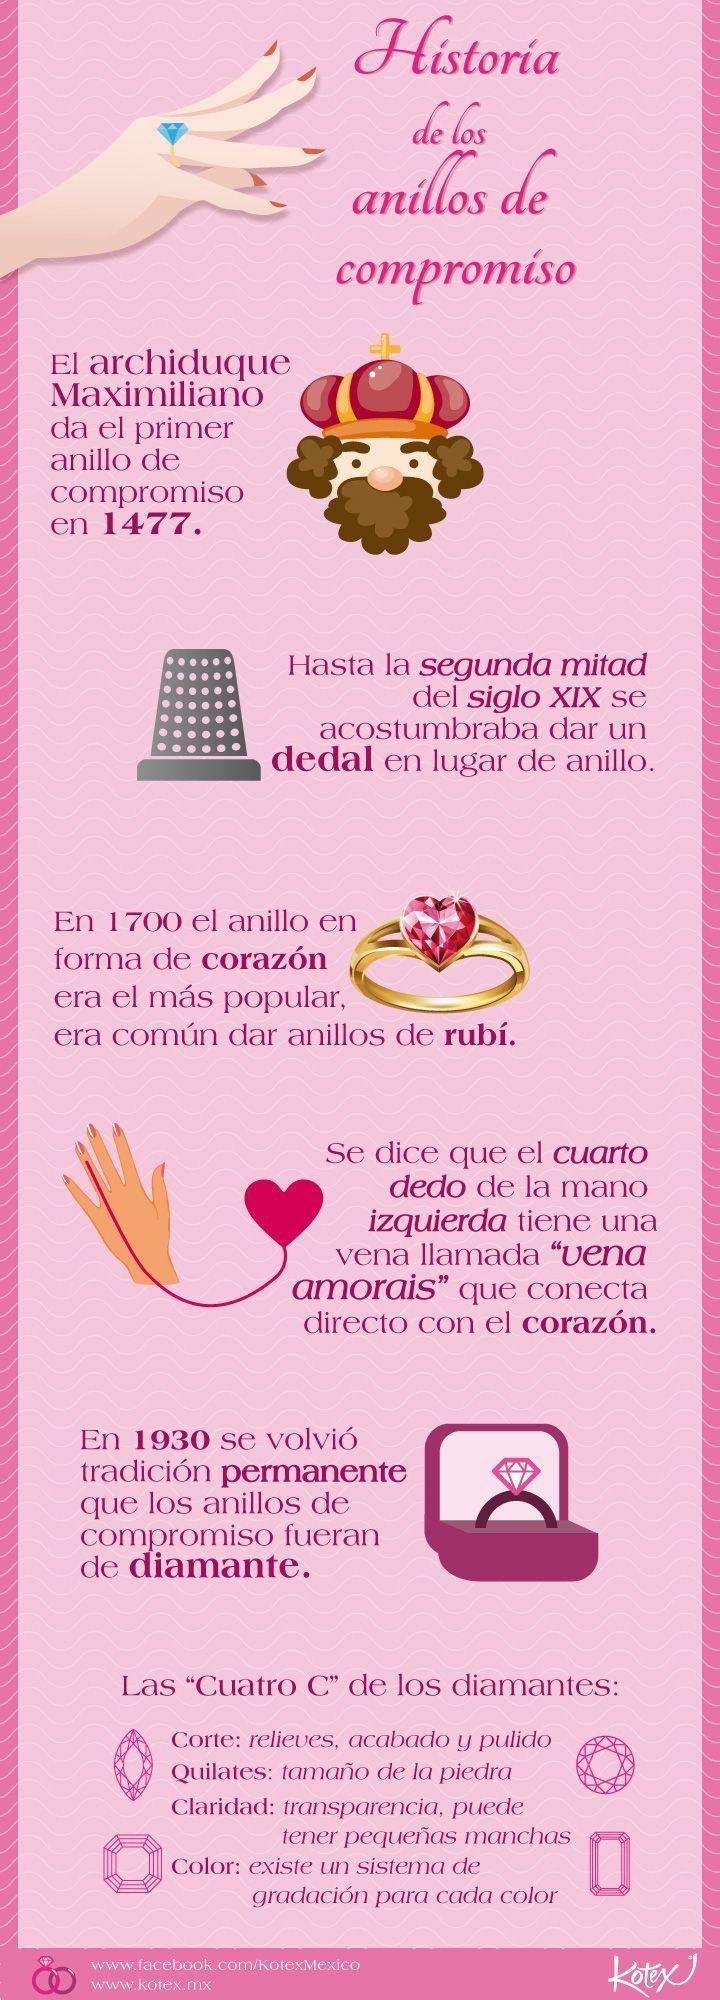 20 best Boda gabriela images on Pinterest | Cake wedding, Weddings ...